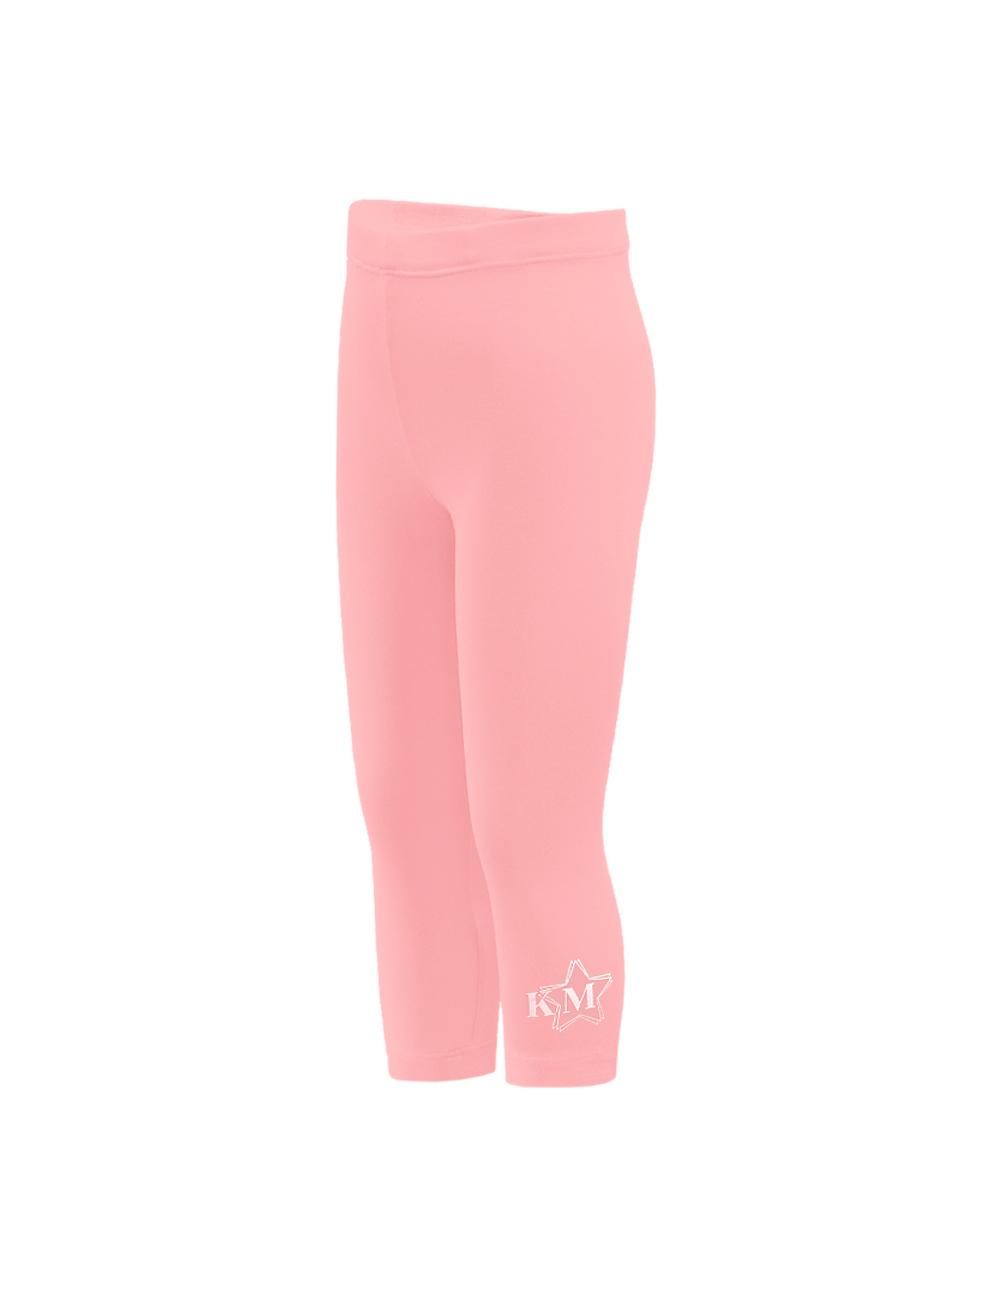 Бриджи для девочки KМ цв.Розовый